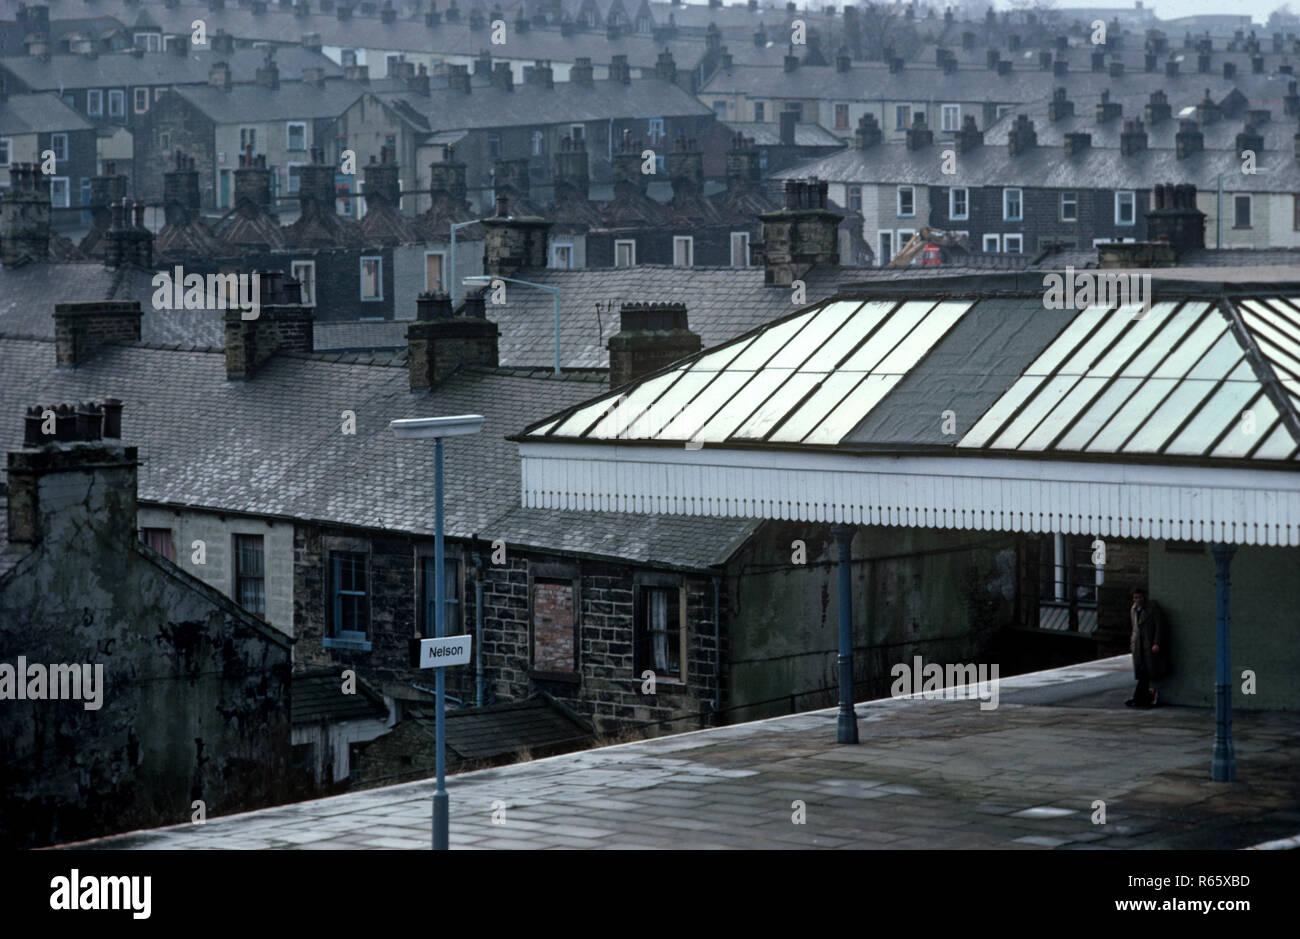 Nelson Station on the British Rail Preston to Colne railway line, Lancashire, Great Britain - Stock Image